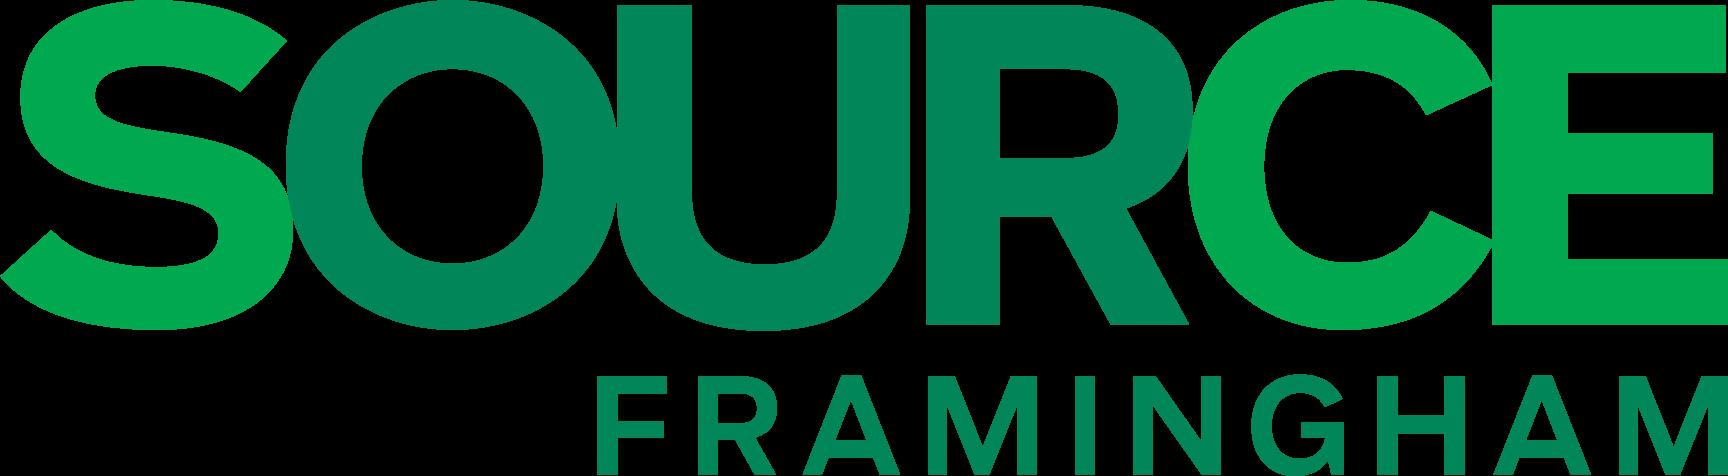 Framingham Source